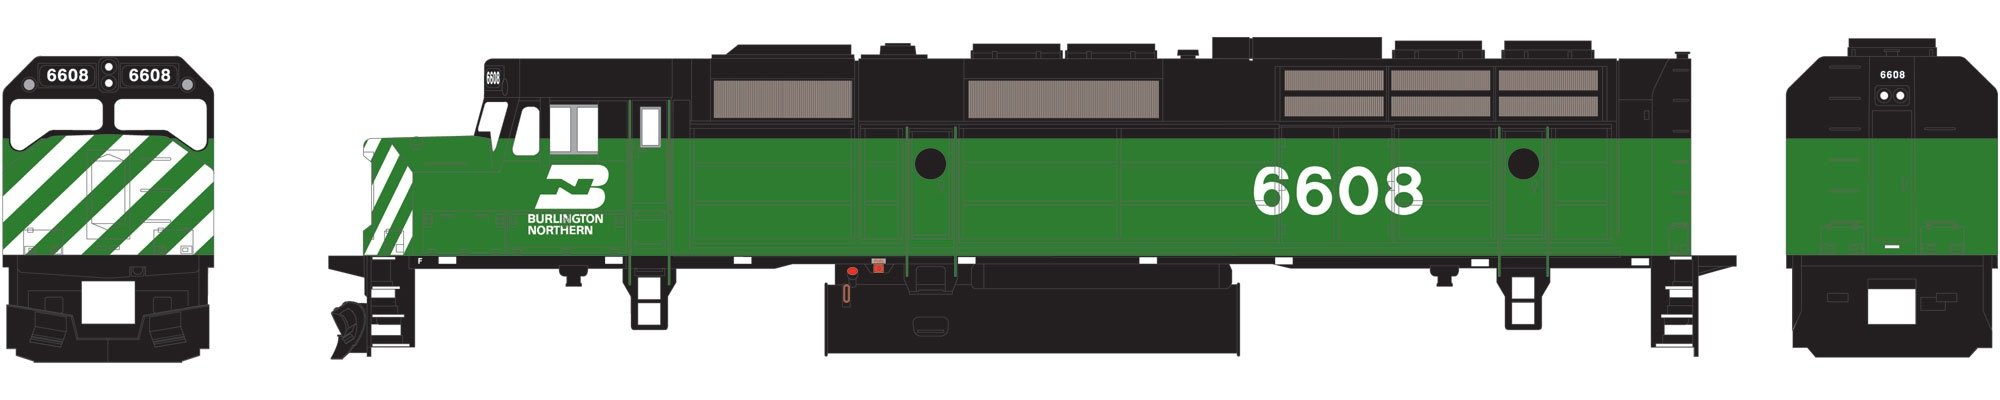 N Scale - Athearn - 22430 - Locomotive, Diesel, EMD F45 - Burlington Northern - 6608